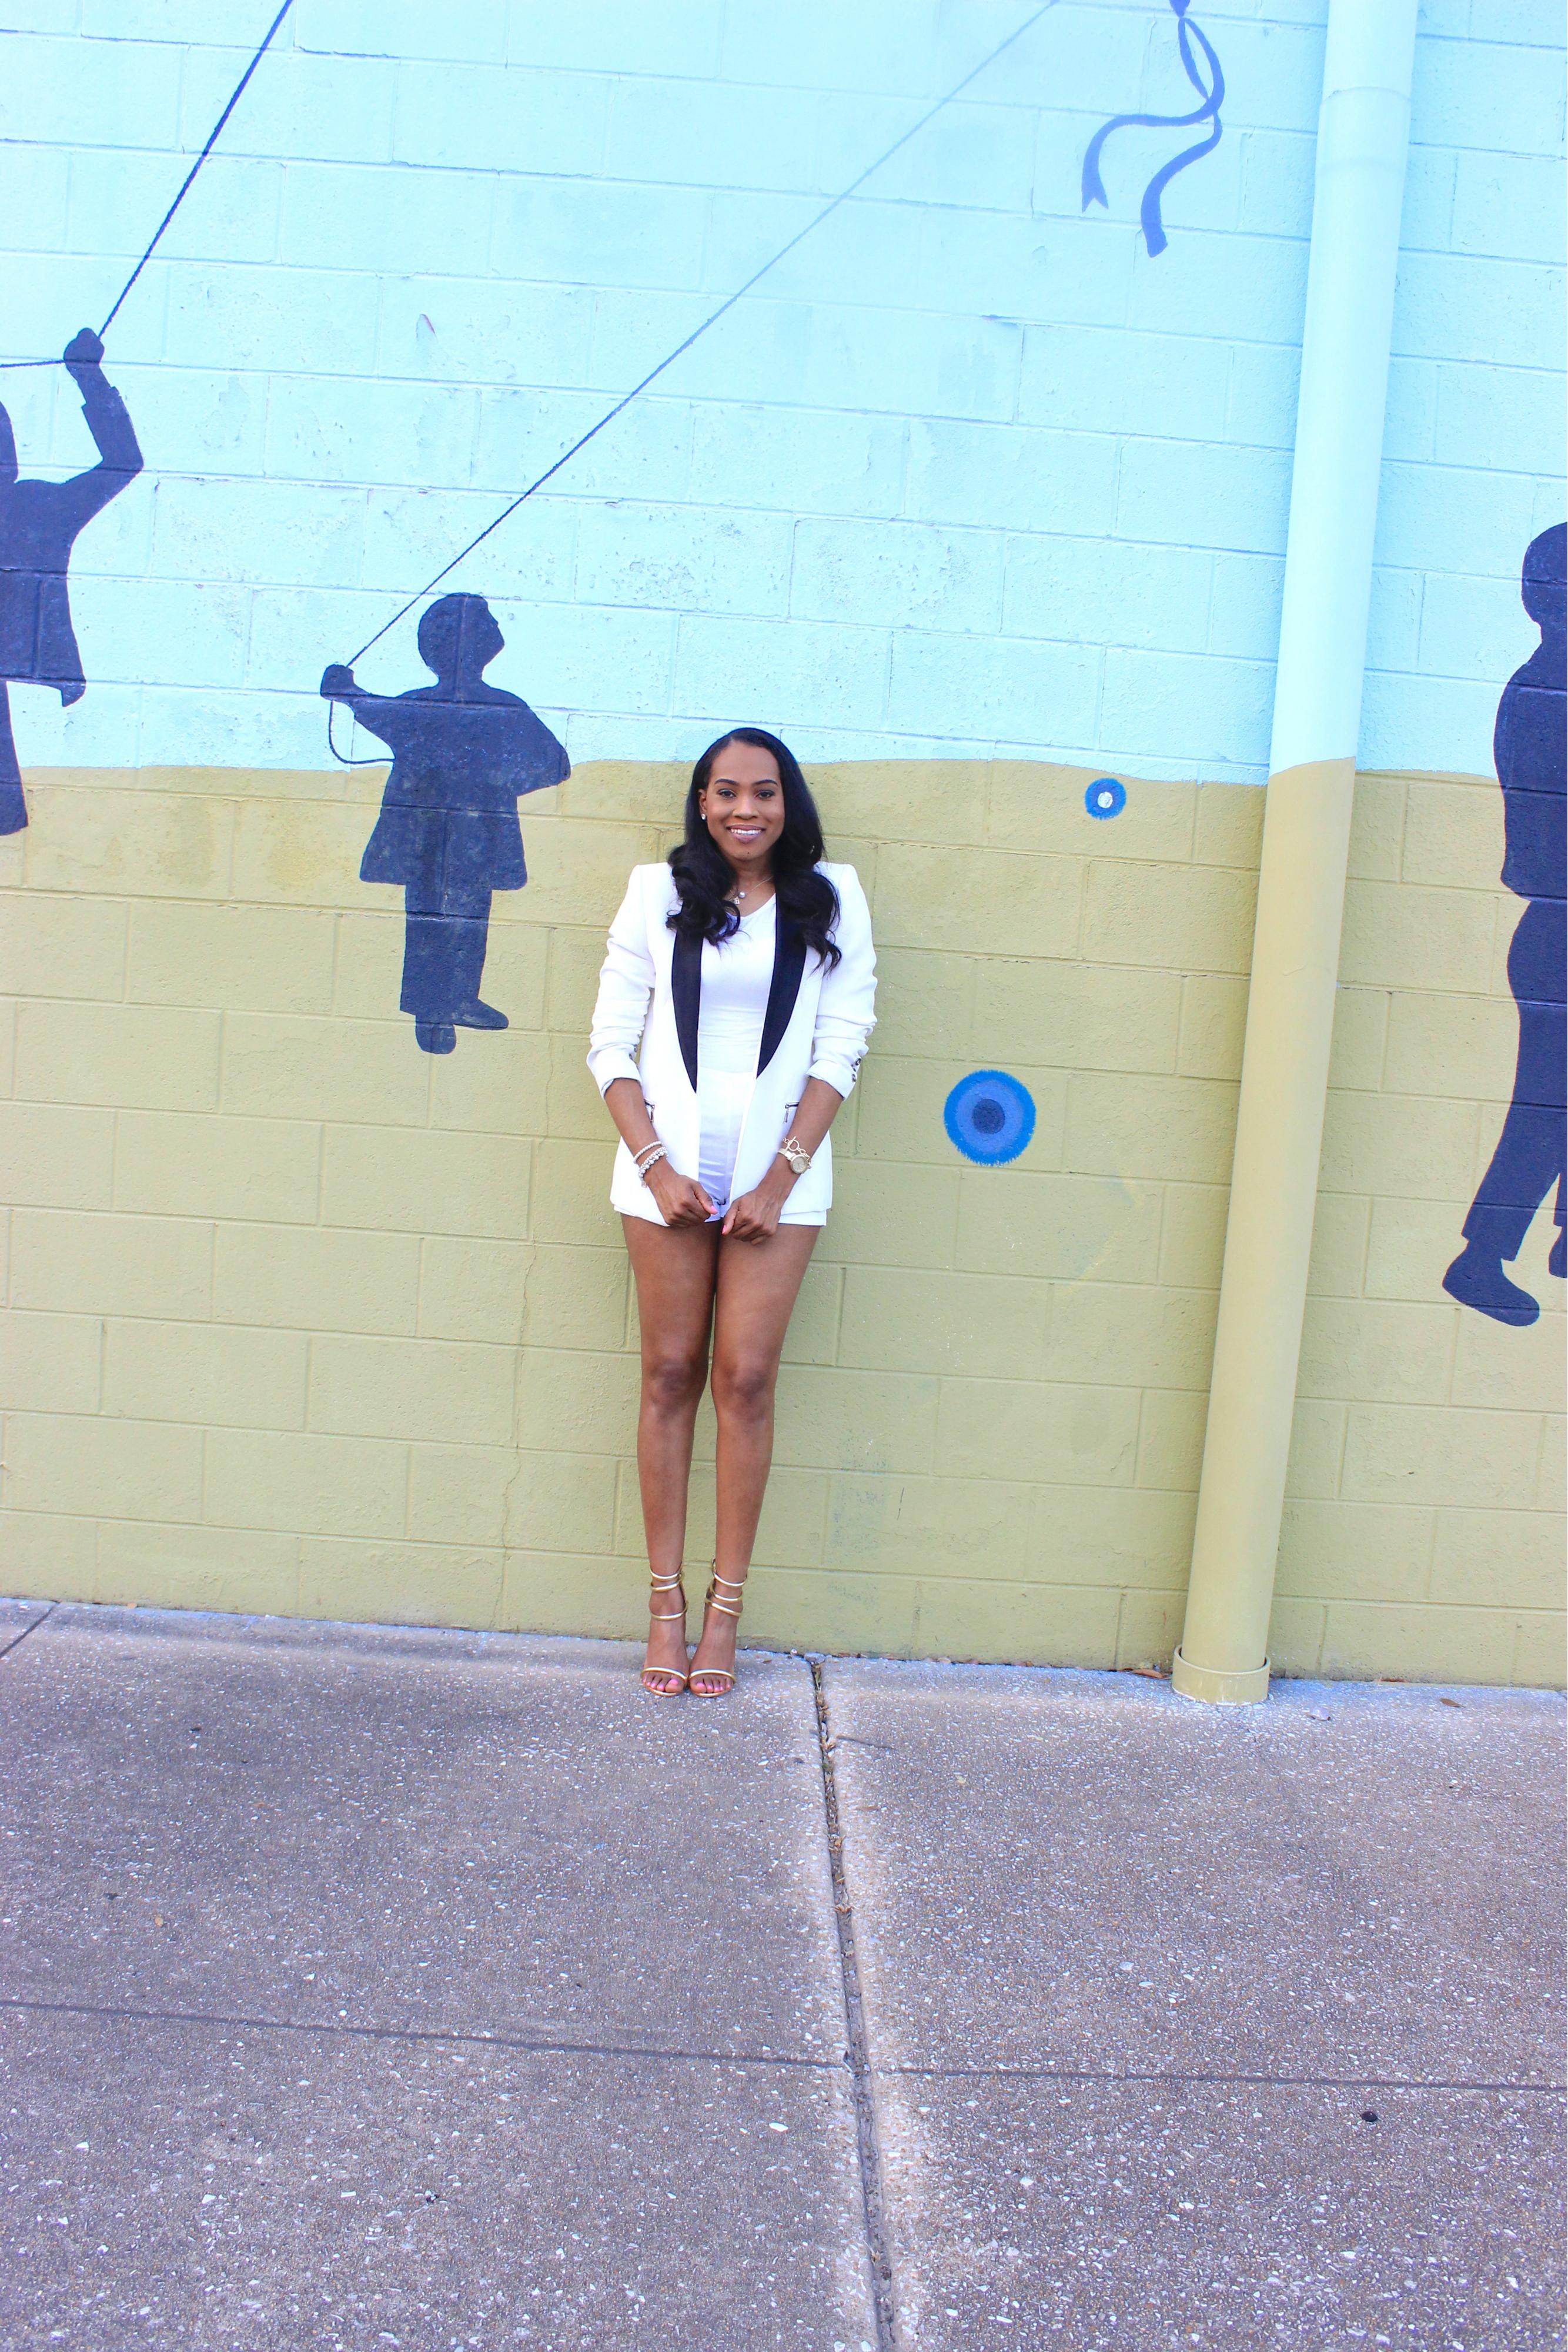 Style-files-forever21-white-zip-back-shorts-forever21-white-blazer with black-lapels-tuxedo-style-blazer-public-desire-Aisha-gold-strappy-heel-sandals-birmingham-top-blogger-oohlalablog-5